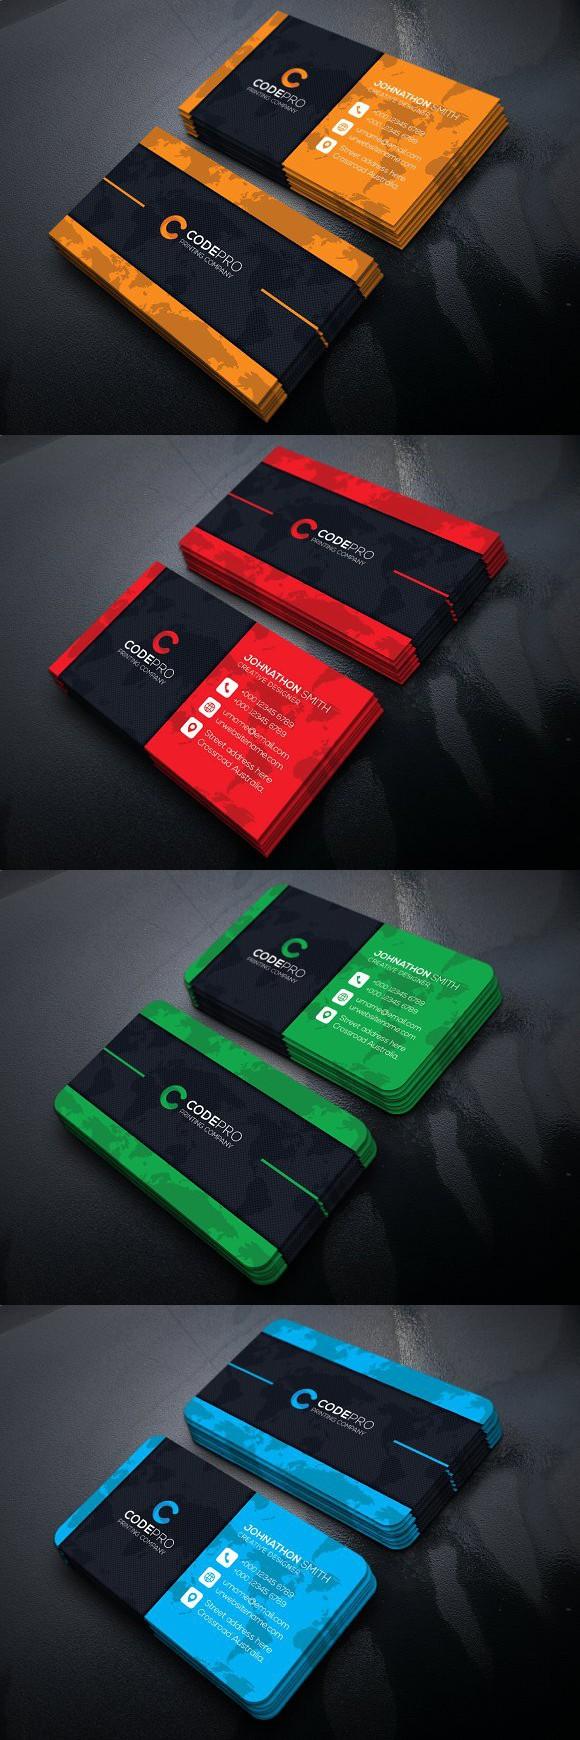 Global Business Card. Business Card Templates | Business Card ...